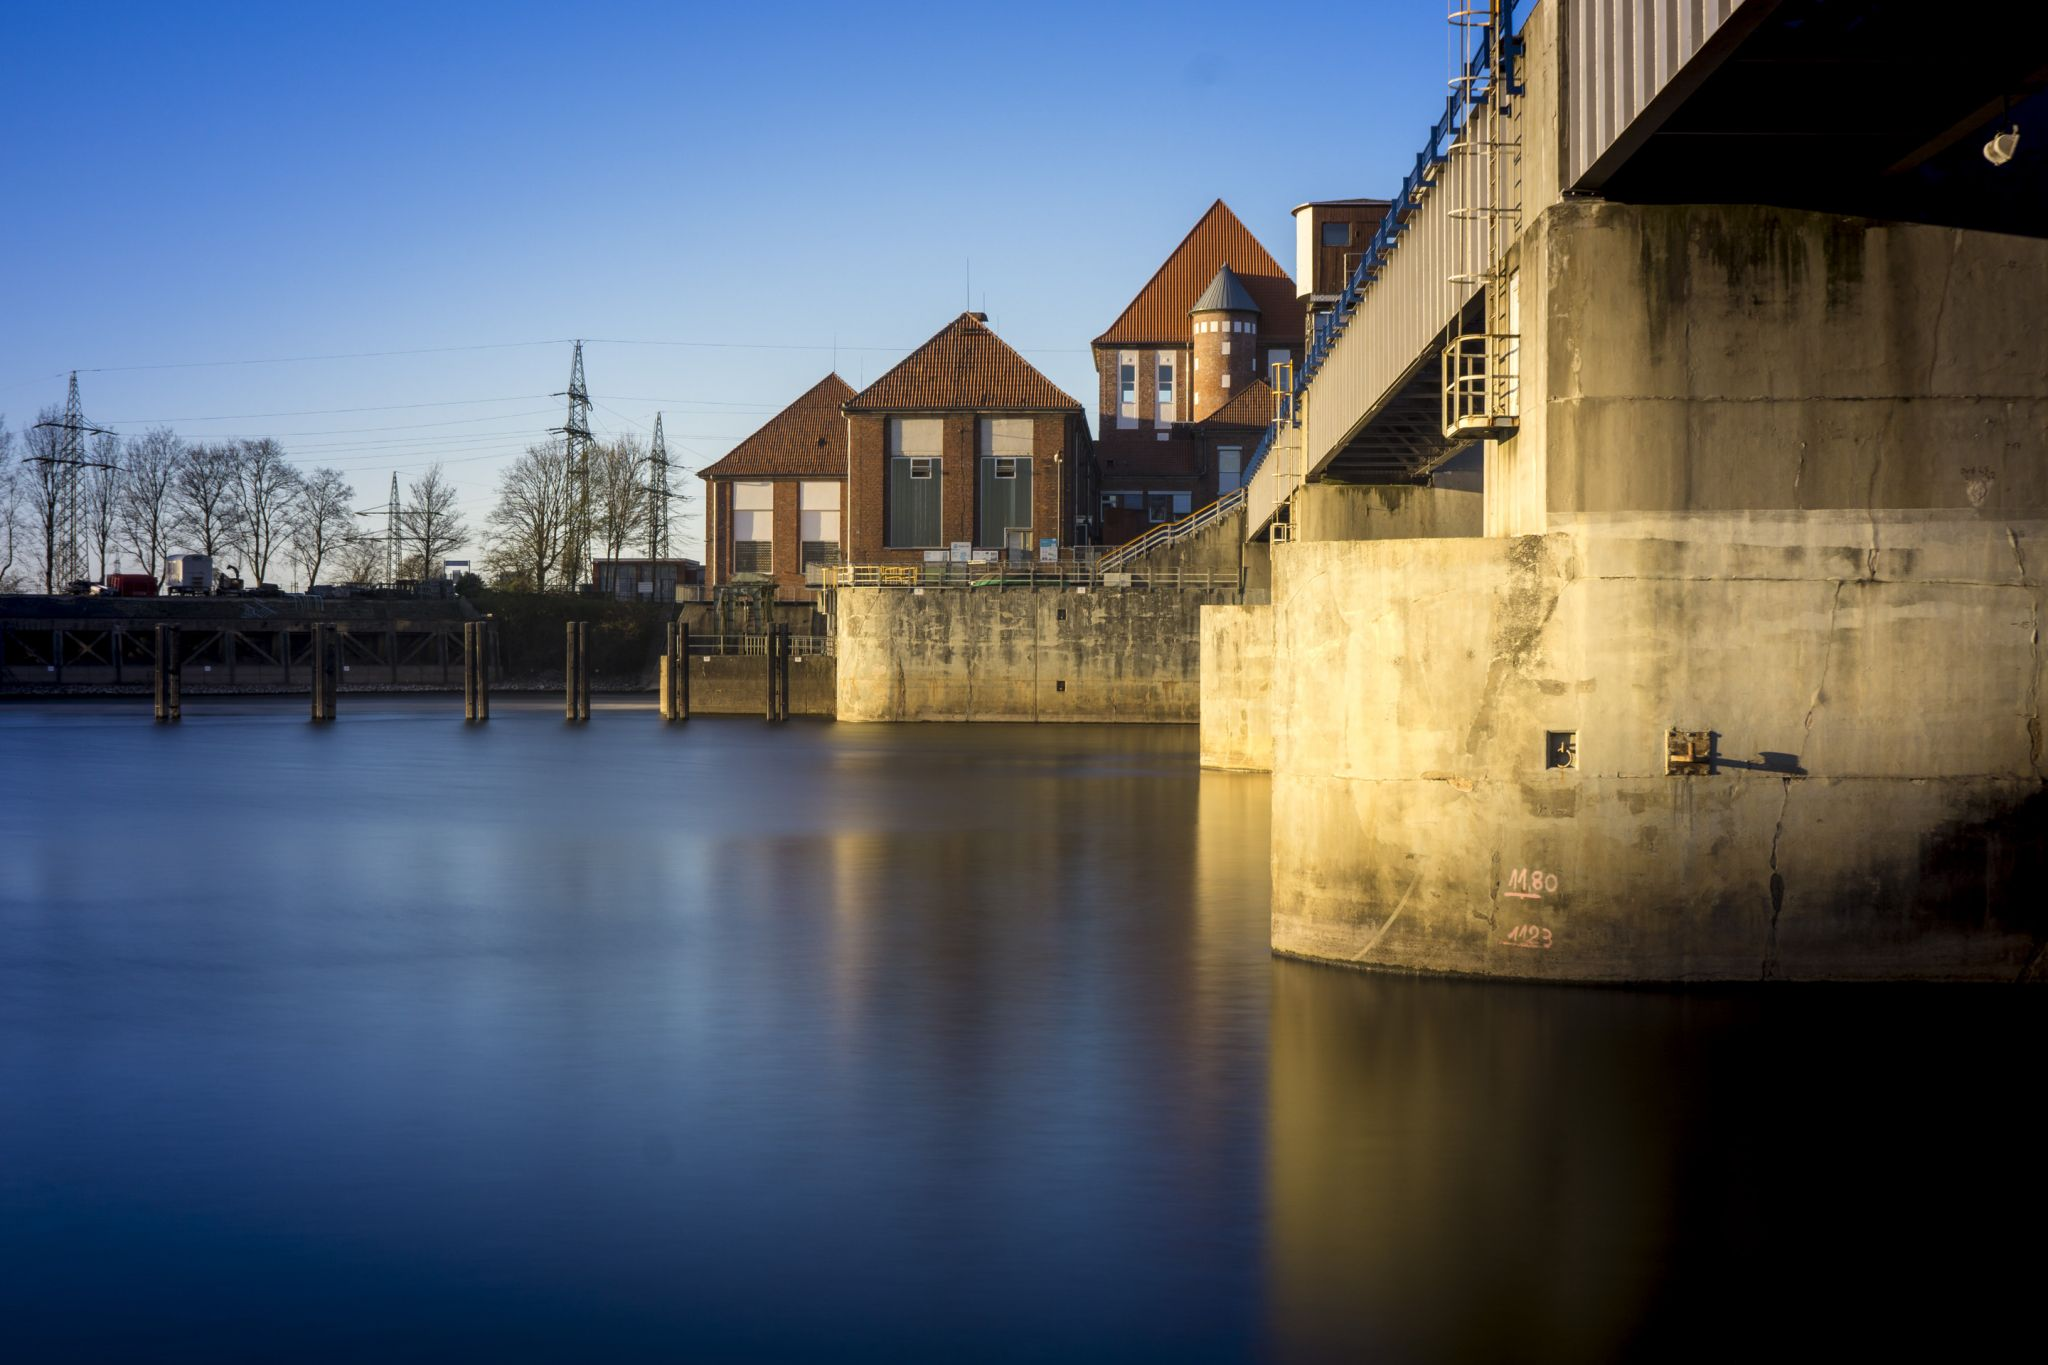 Dörverden Hydroelectric Power Station, Germany